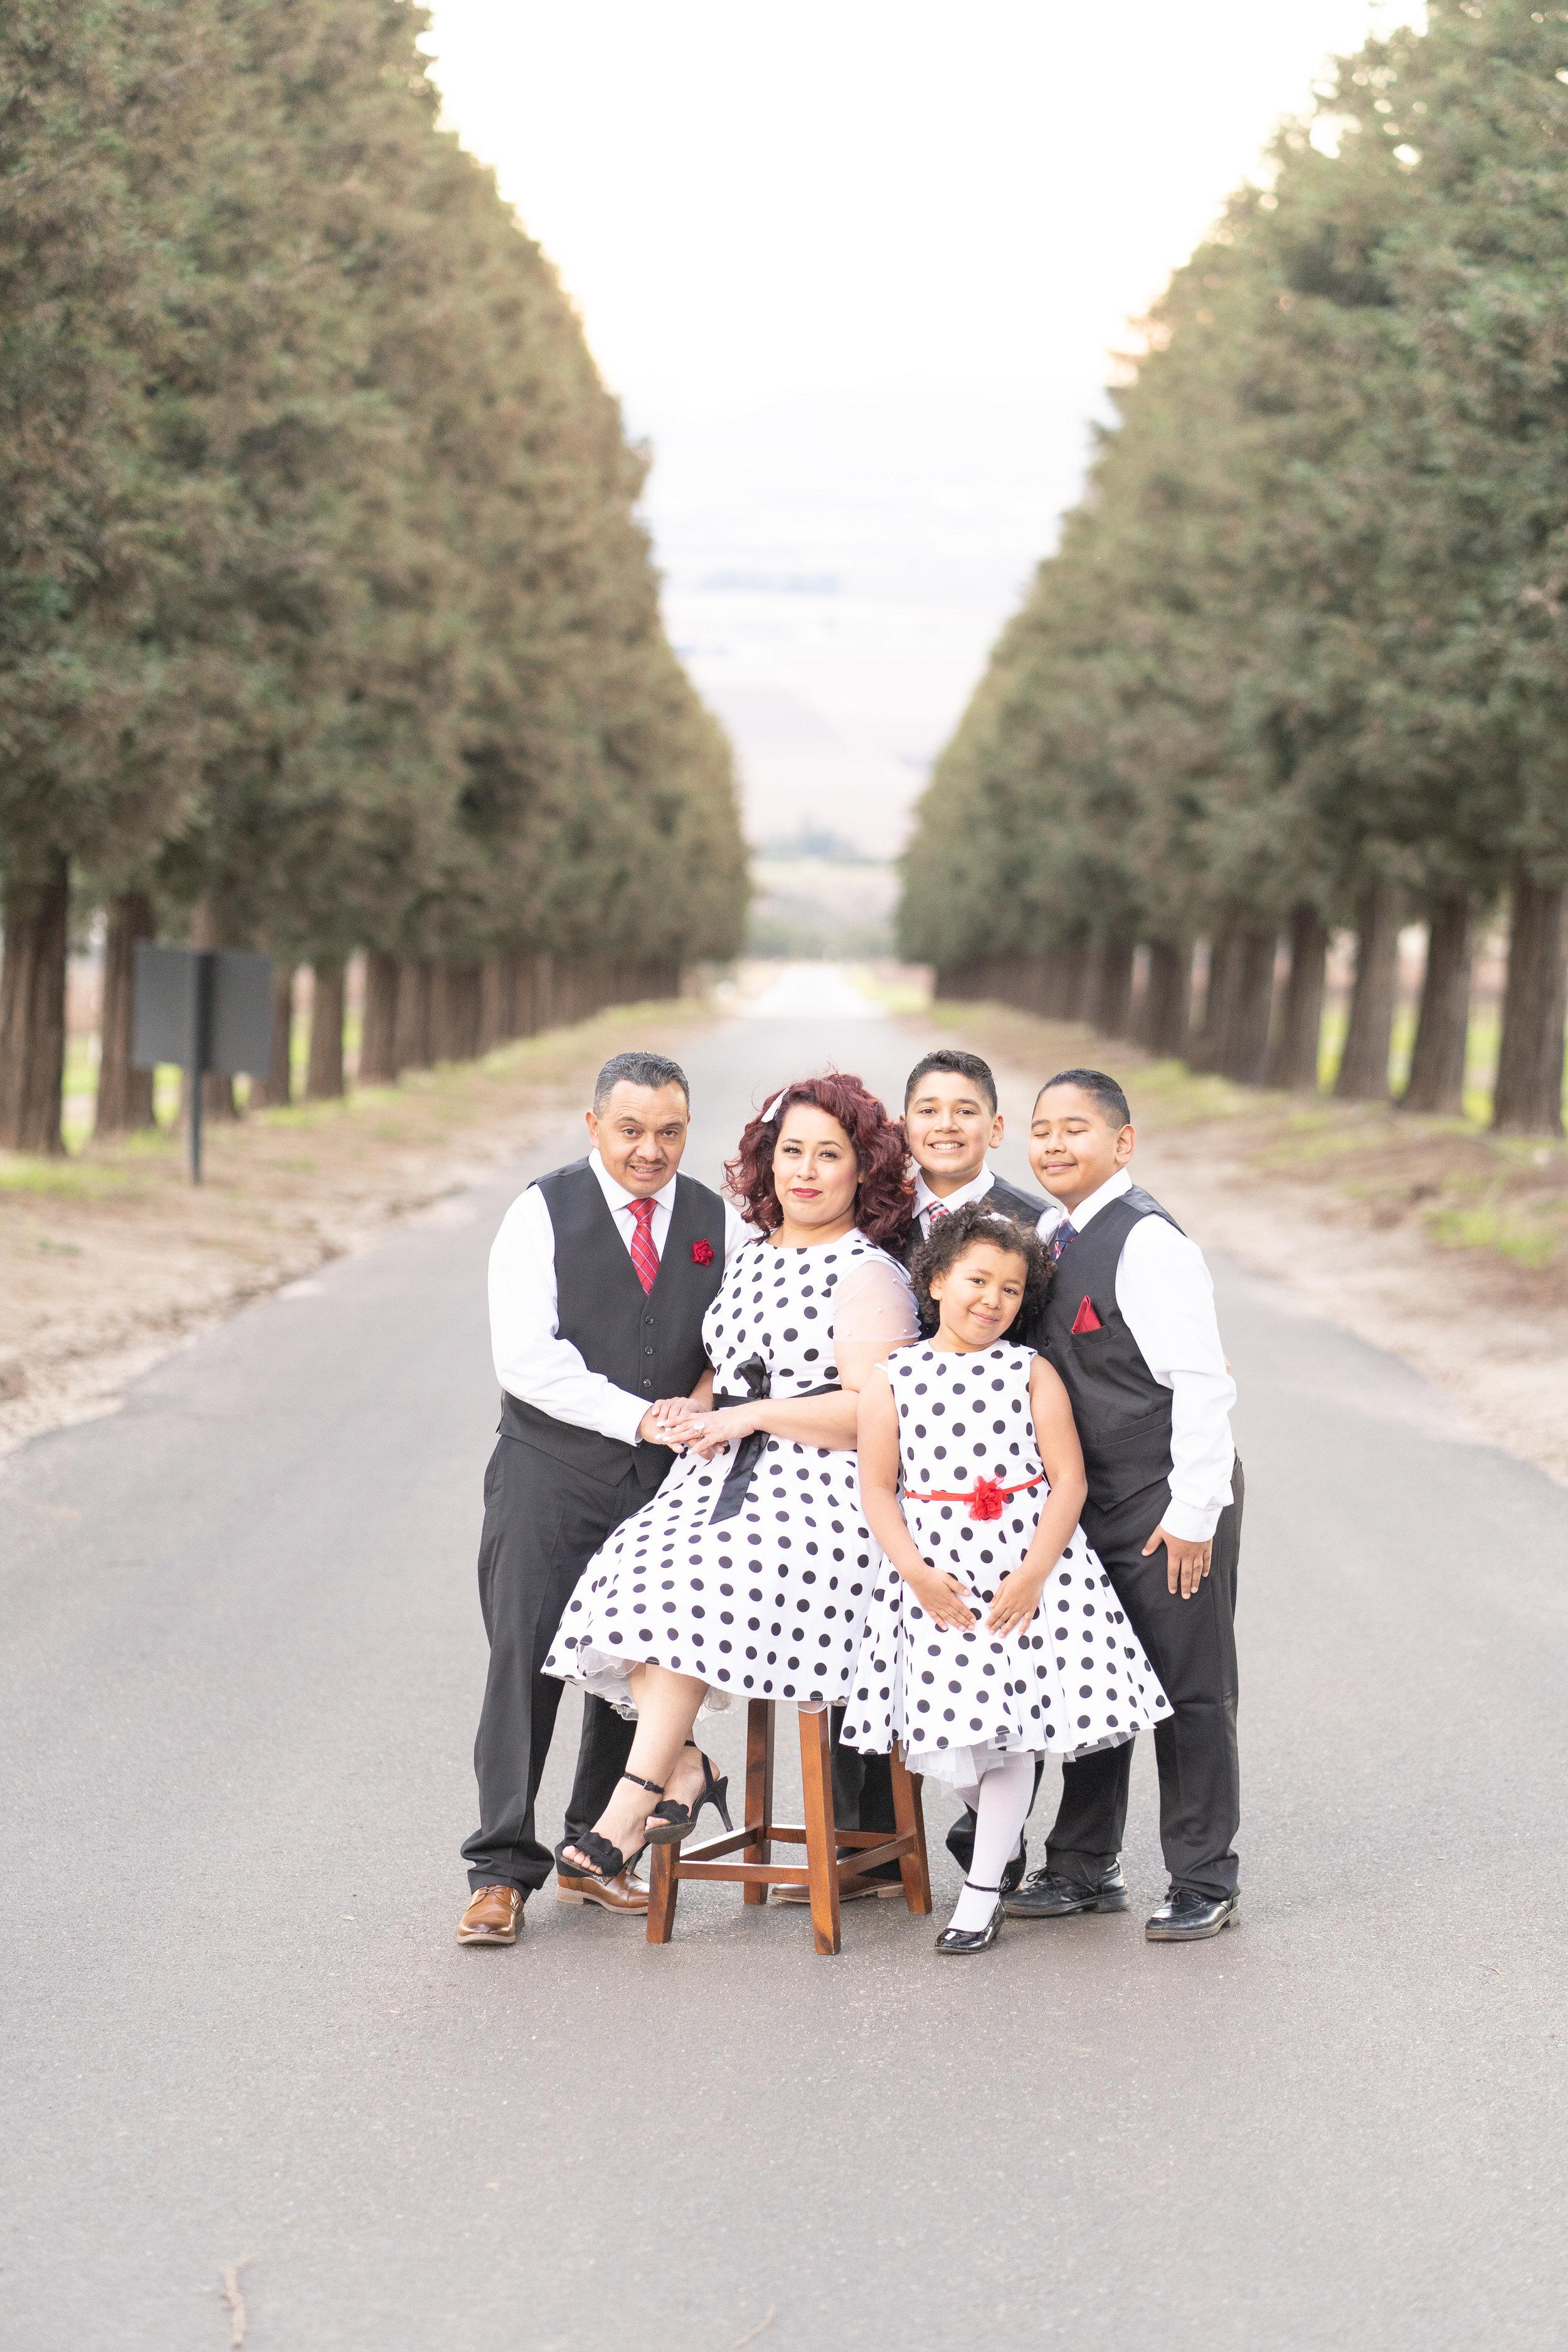 mares-family-hahn-winery-photographer-77.JPG